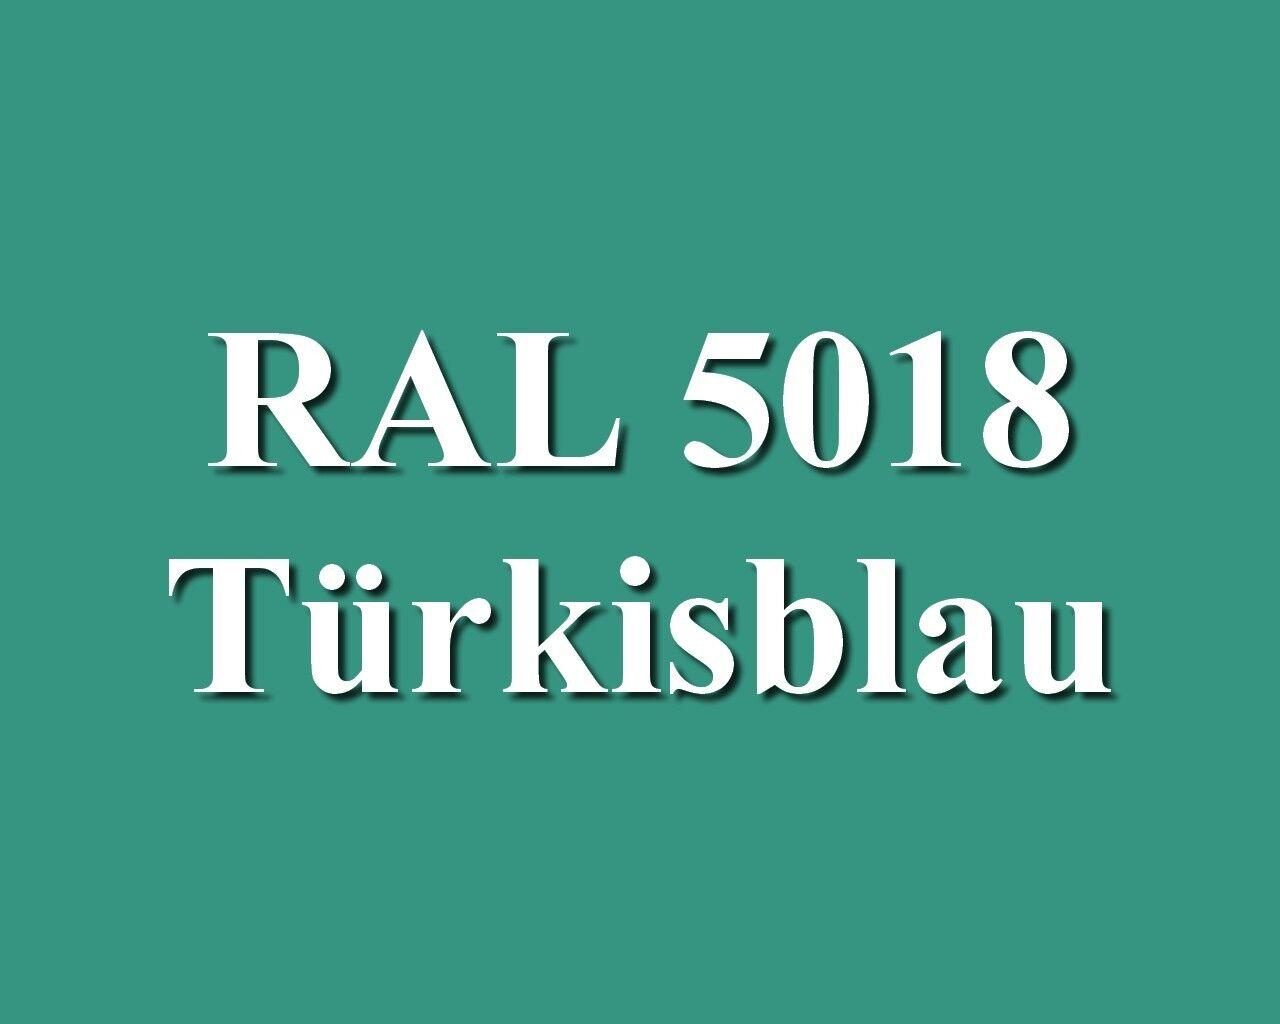 3 Liter Set Set Set 2K Bodenbeschichtung RAL 5018 Türkisblau Glanz Bodenfarbe Werkstatt b452a7